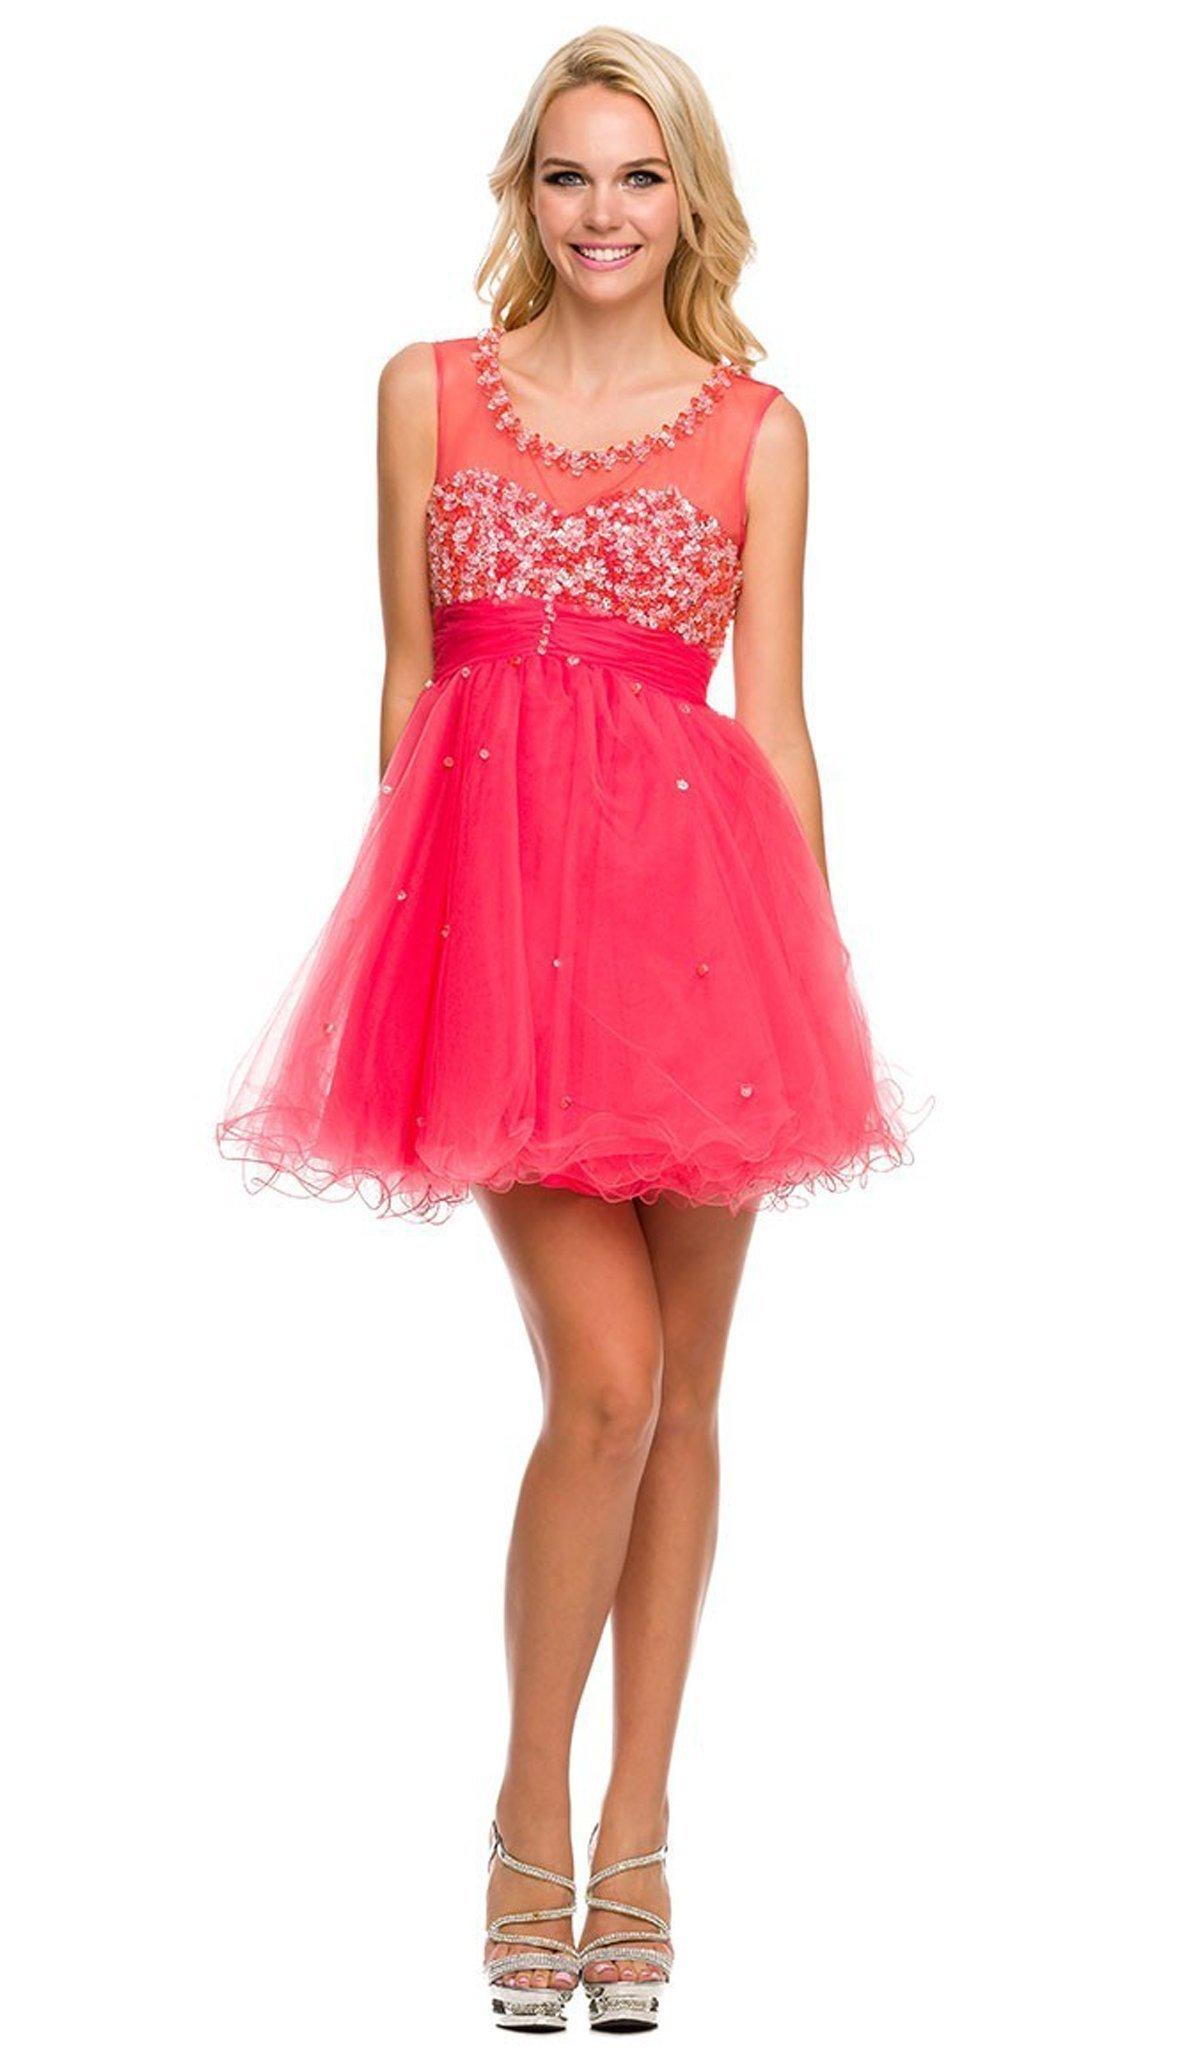 Nox Anabel - 6011 Bejeweled Illusion Scoop Neck Dress